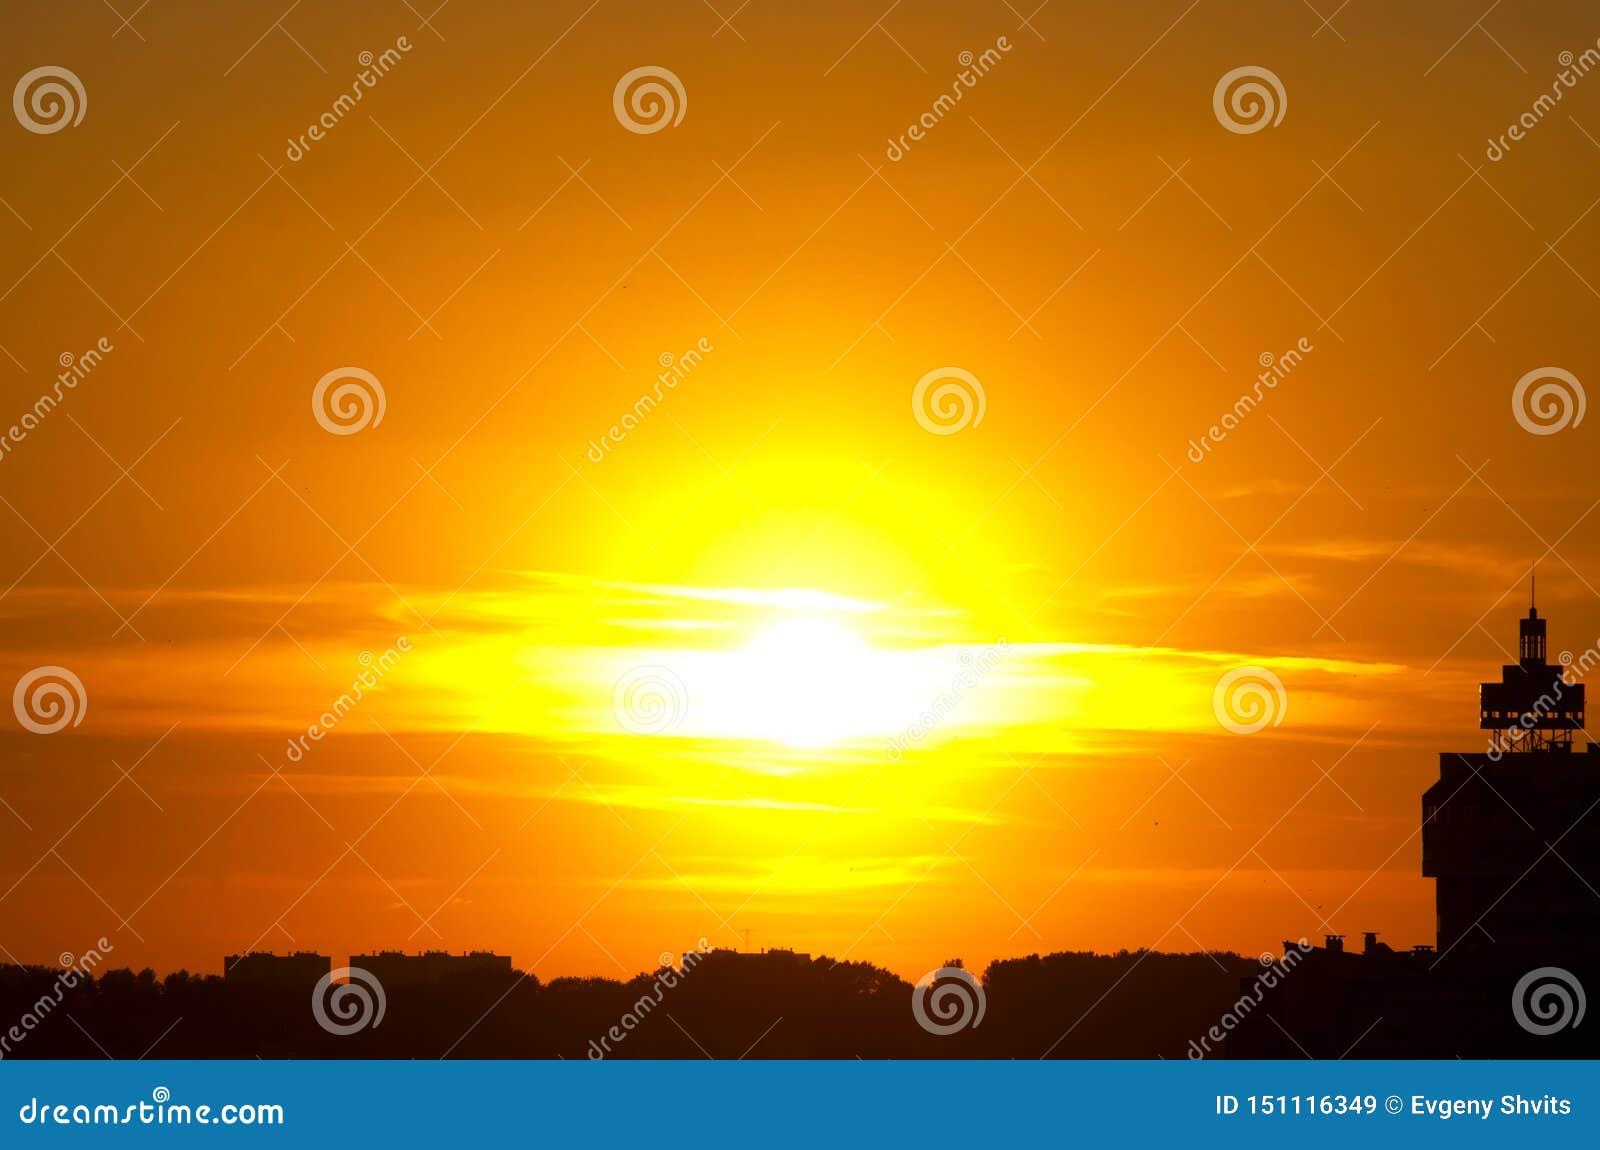 Rode zonsondergang zonneontploffing, zon bij wolken, stadssilhouet